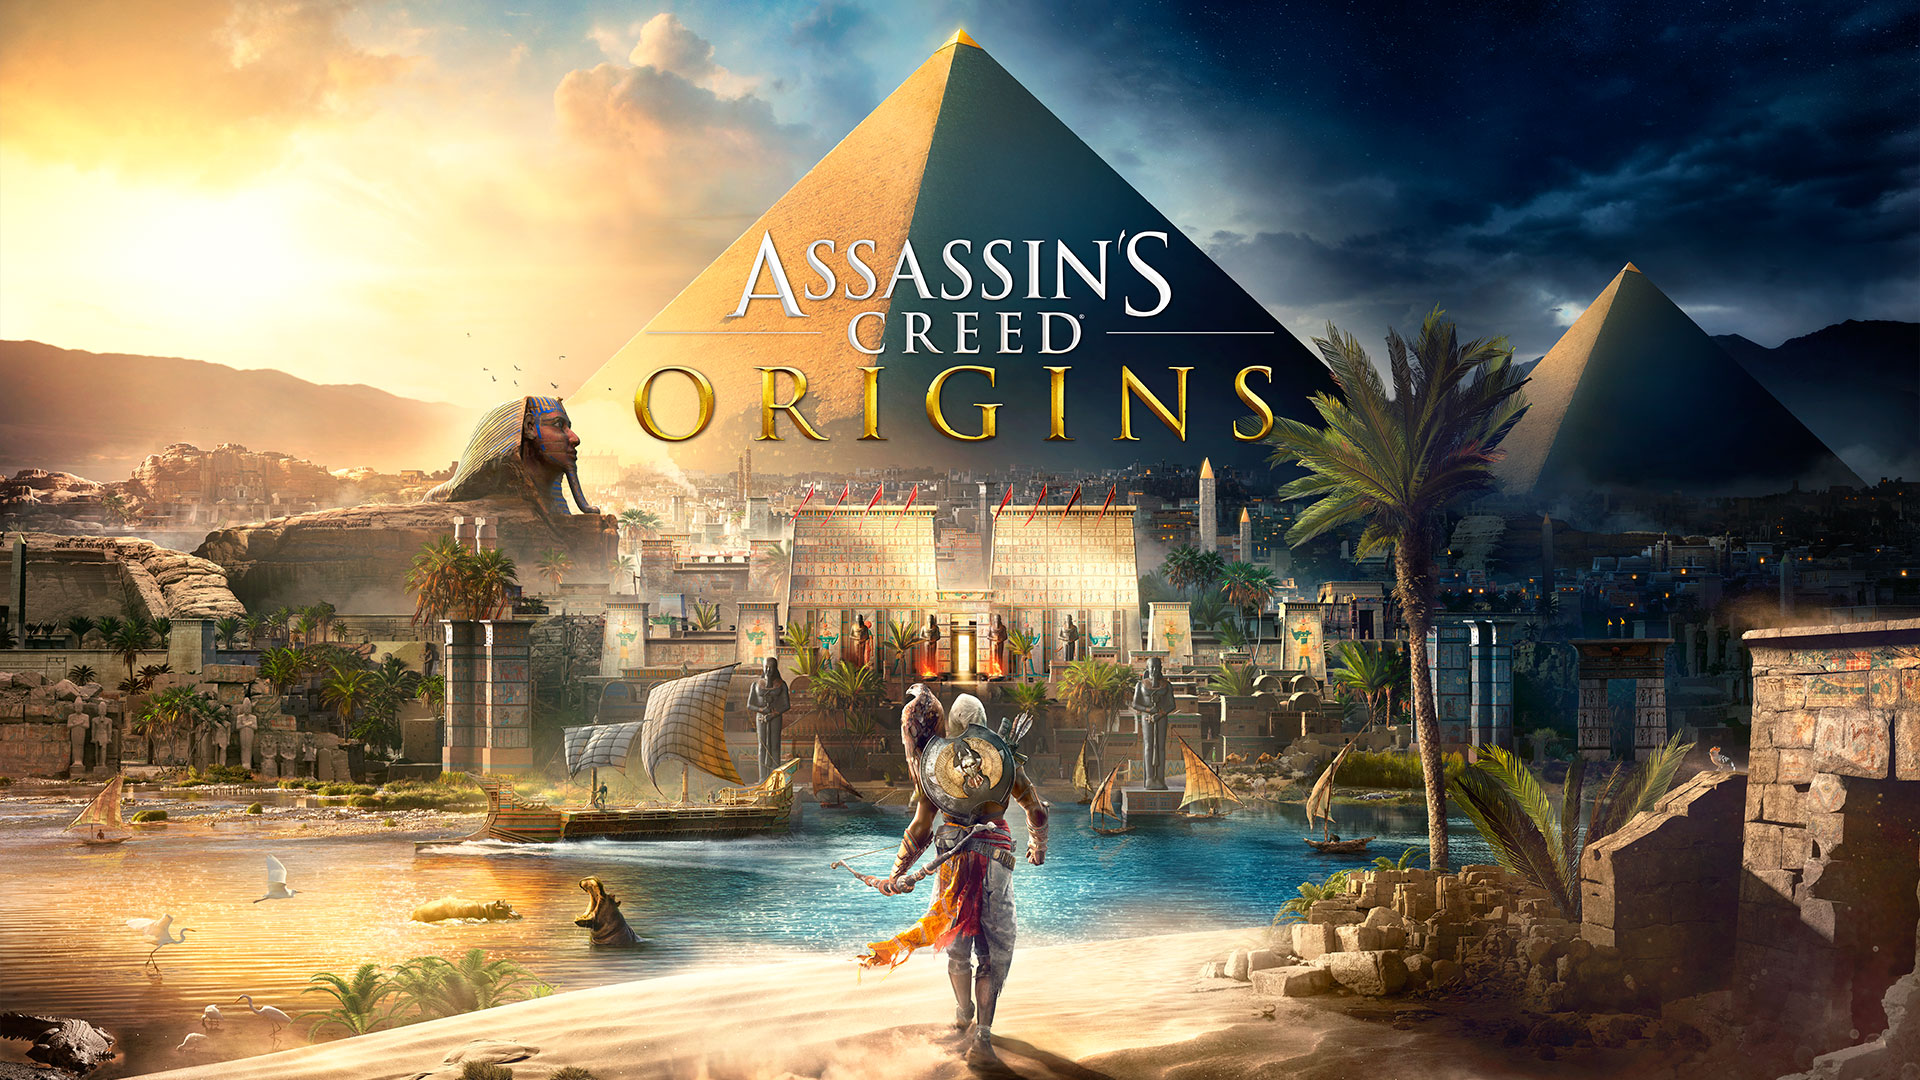 """Assasins Creed Origins"" tendrá visitas guiadas al antiguo Egipto"